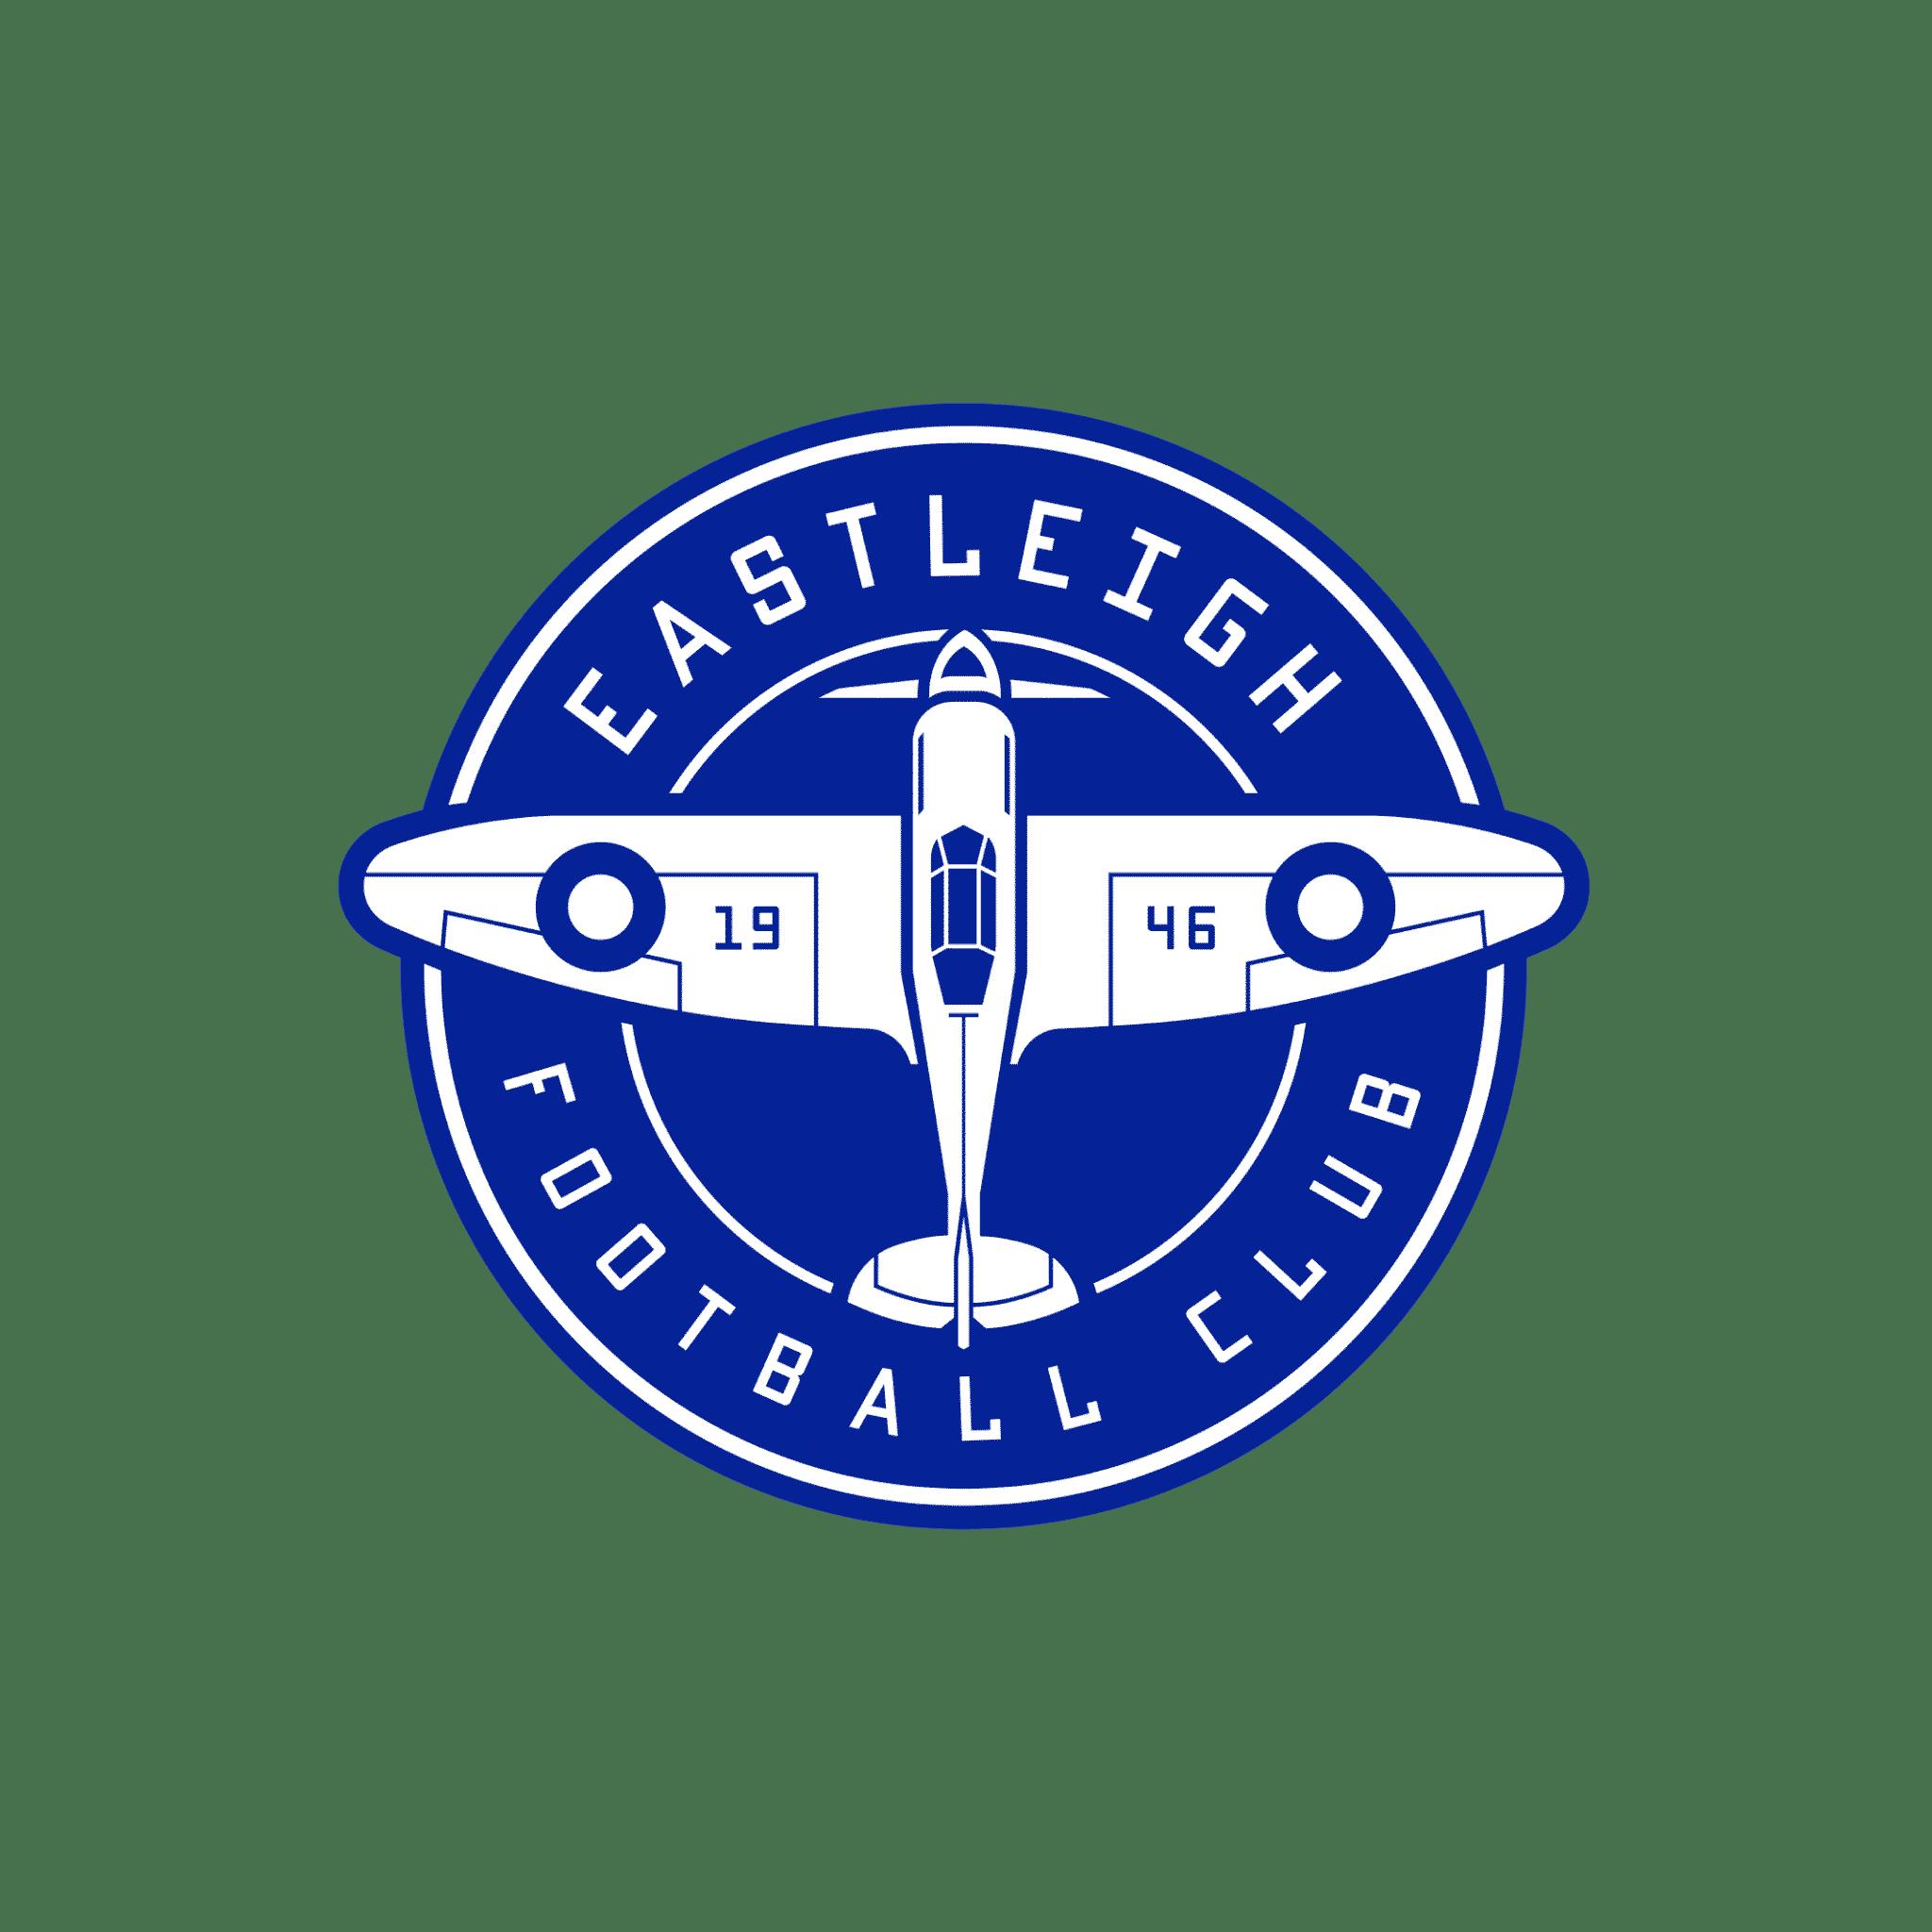 Eastleigh Football club logo